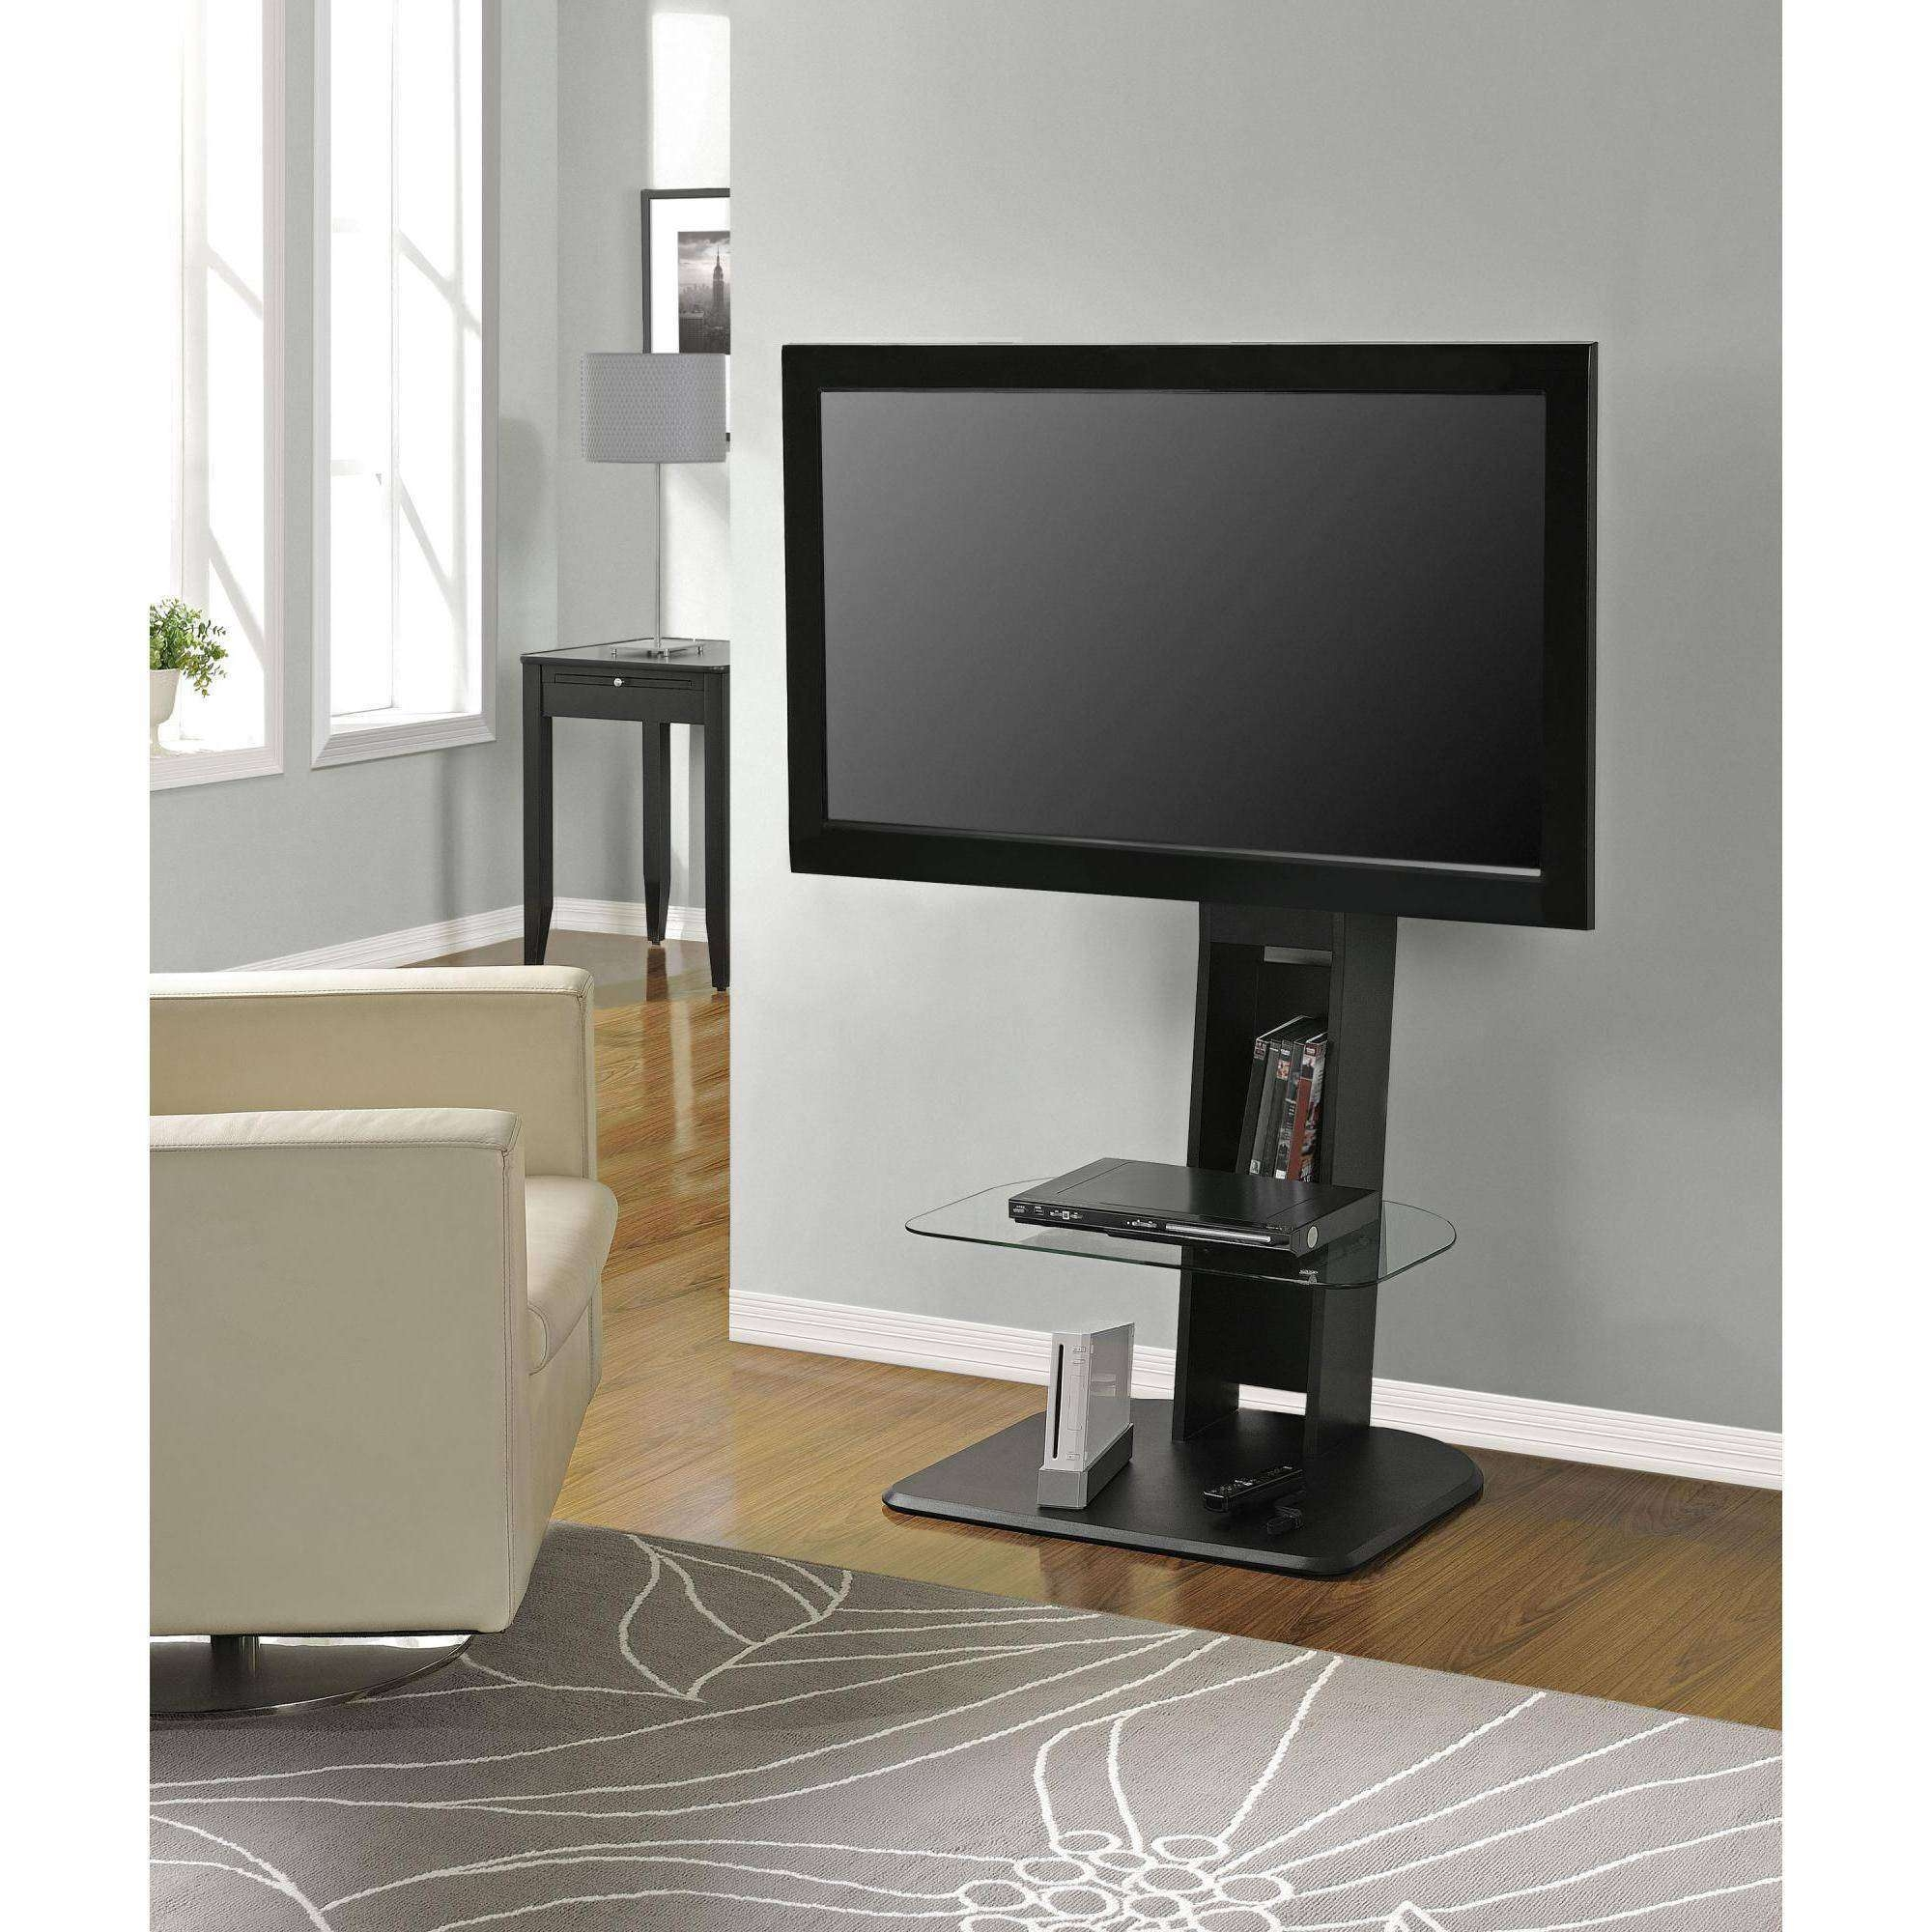 Tv Stands & Entertainment Centers – Walmart Regarding Cheap Corner Tv Stands For Flat Screen (View 18 of 20)